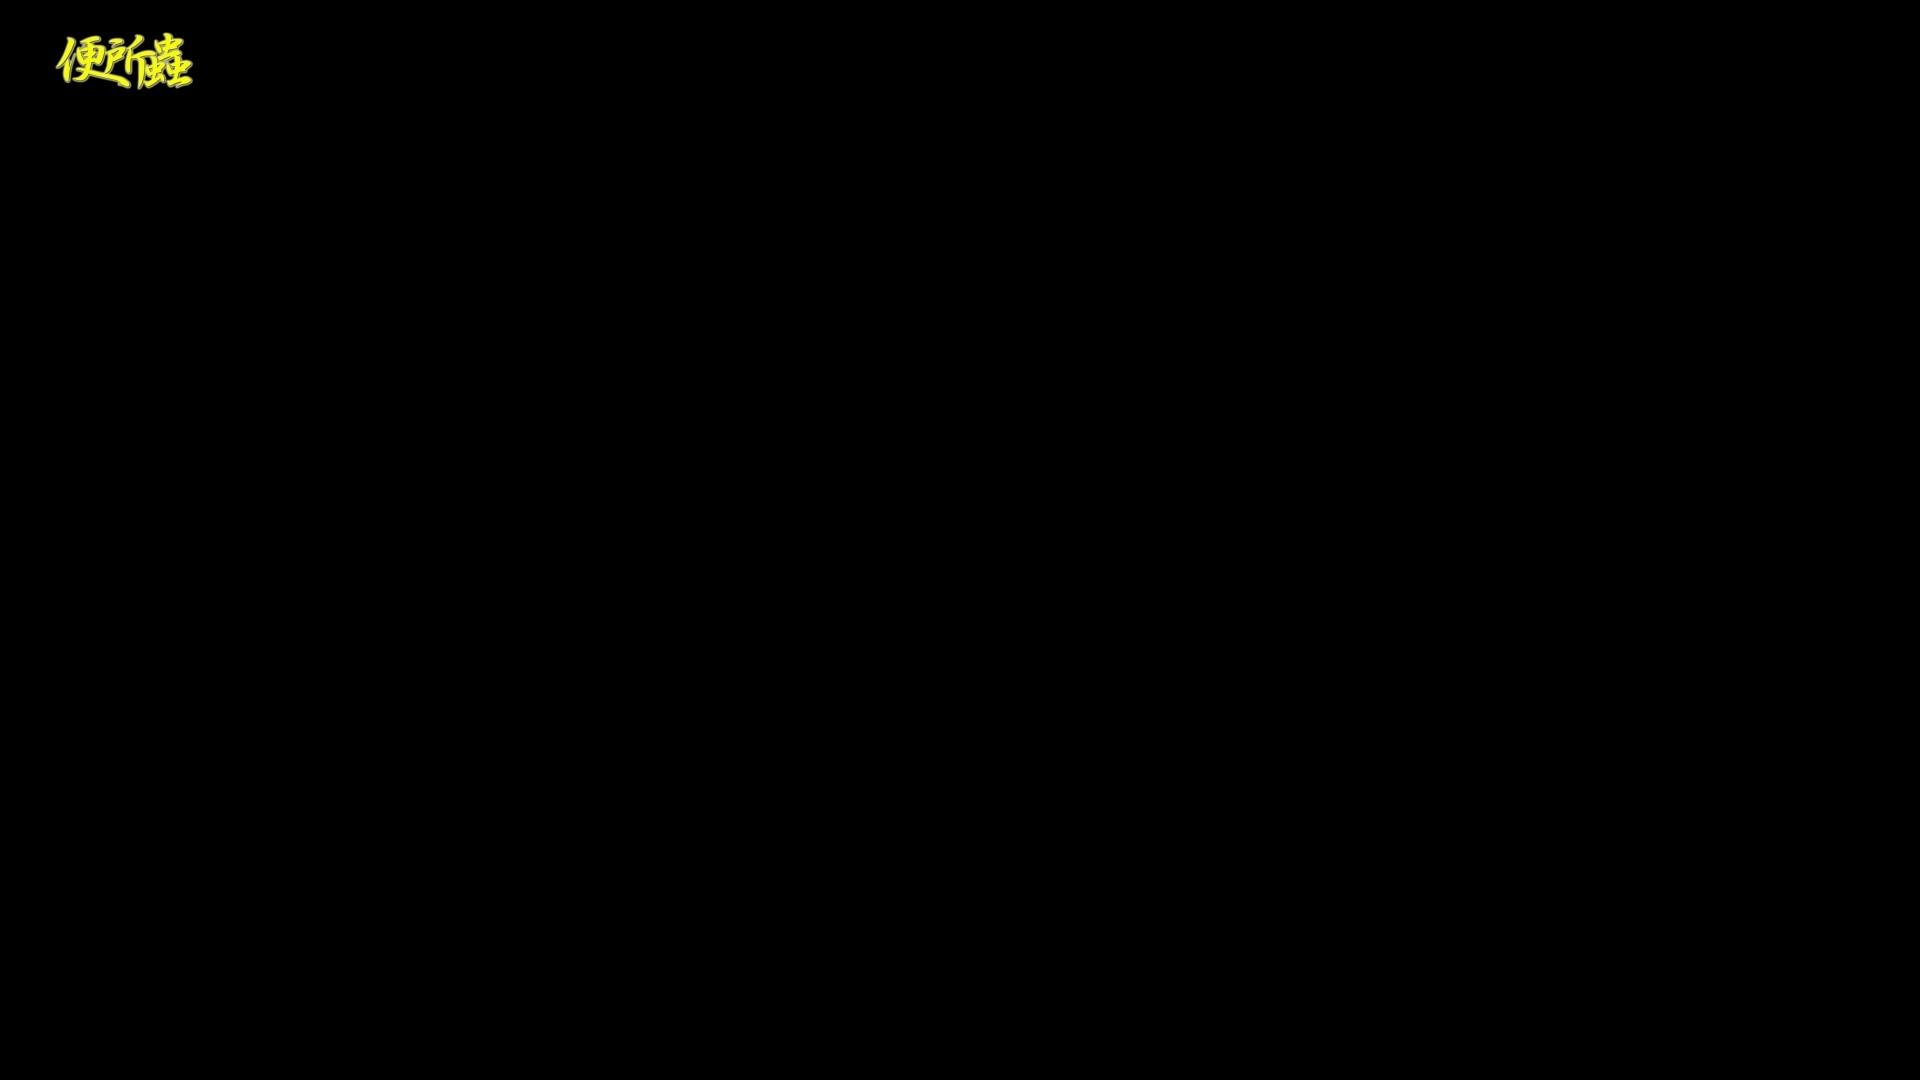 vol.08 便所蟲さんのリターン~寺子屋洗面所盗撮~ 盗撮・必見 SEX無修正画像 72画像 45